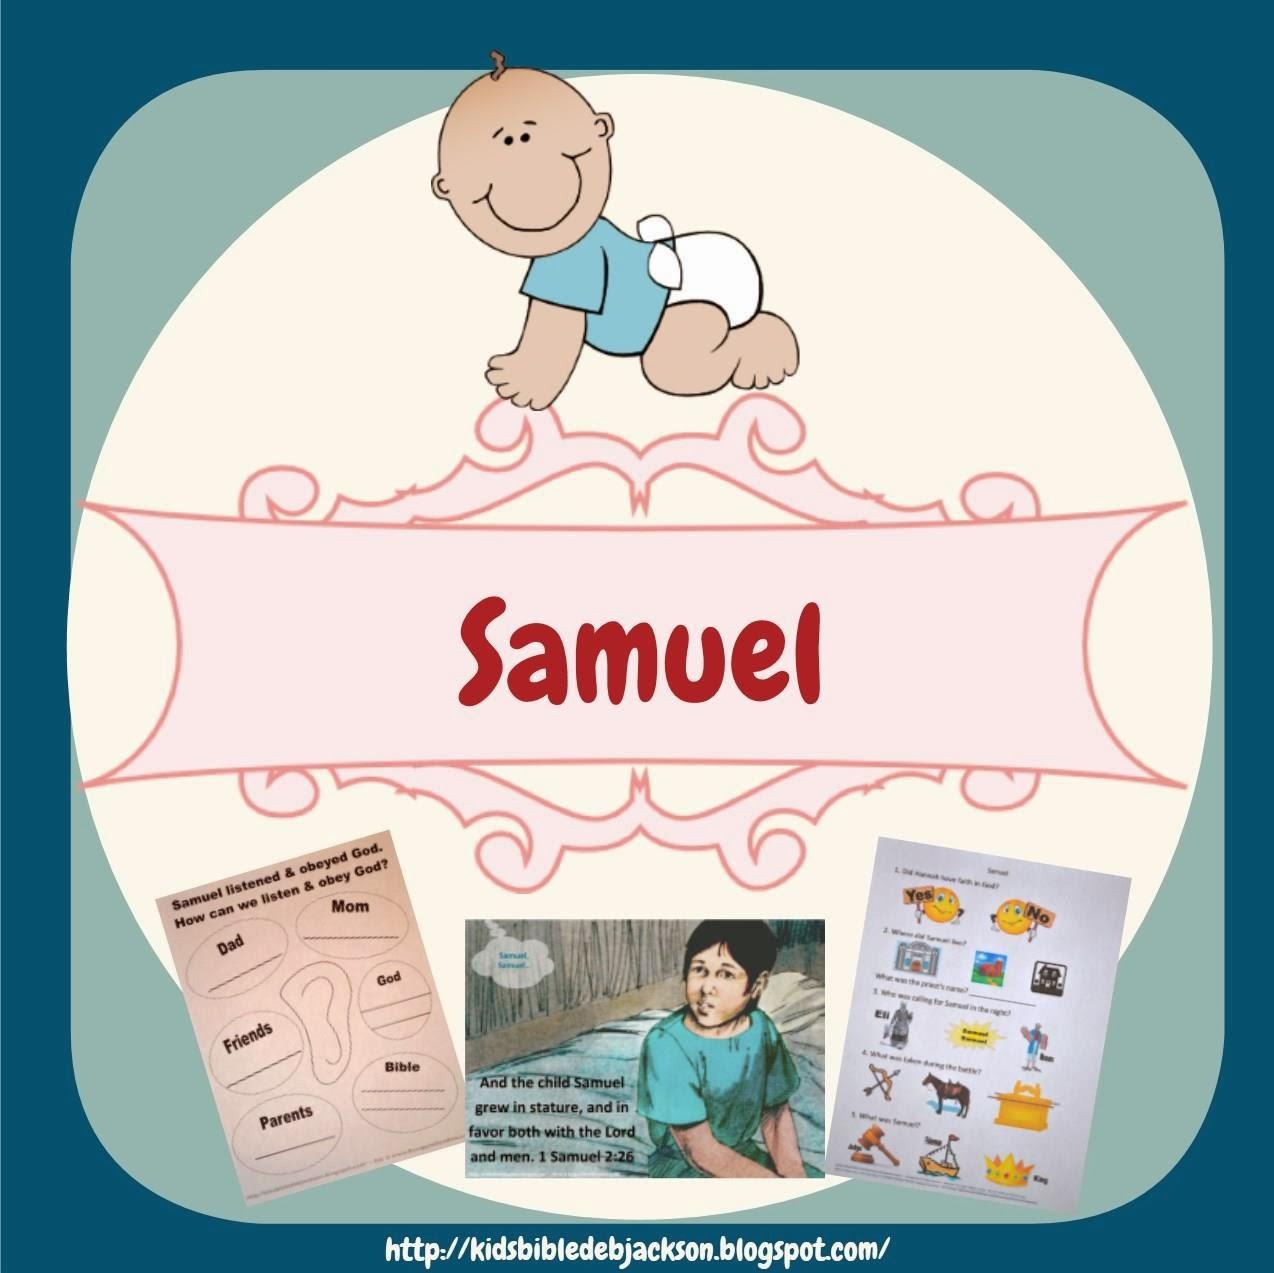 http://kidsbibledebjackson.blogspot.com/2014/01/samuel.html